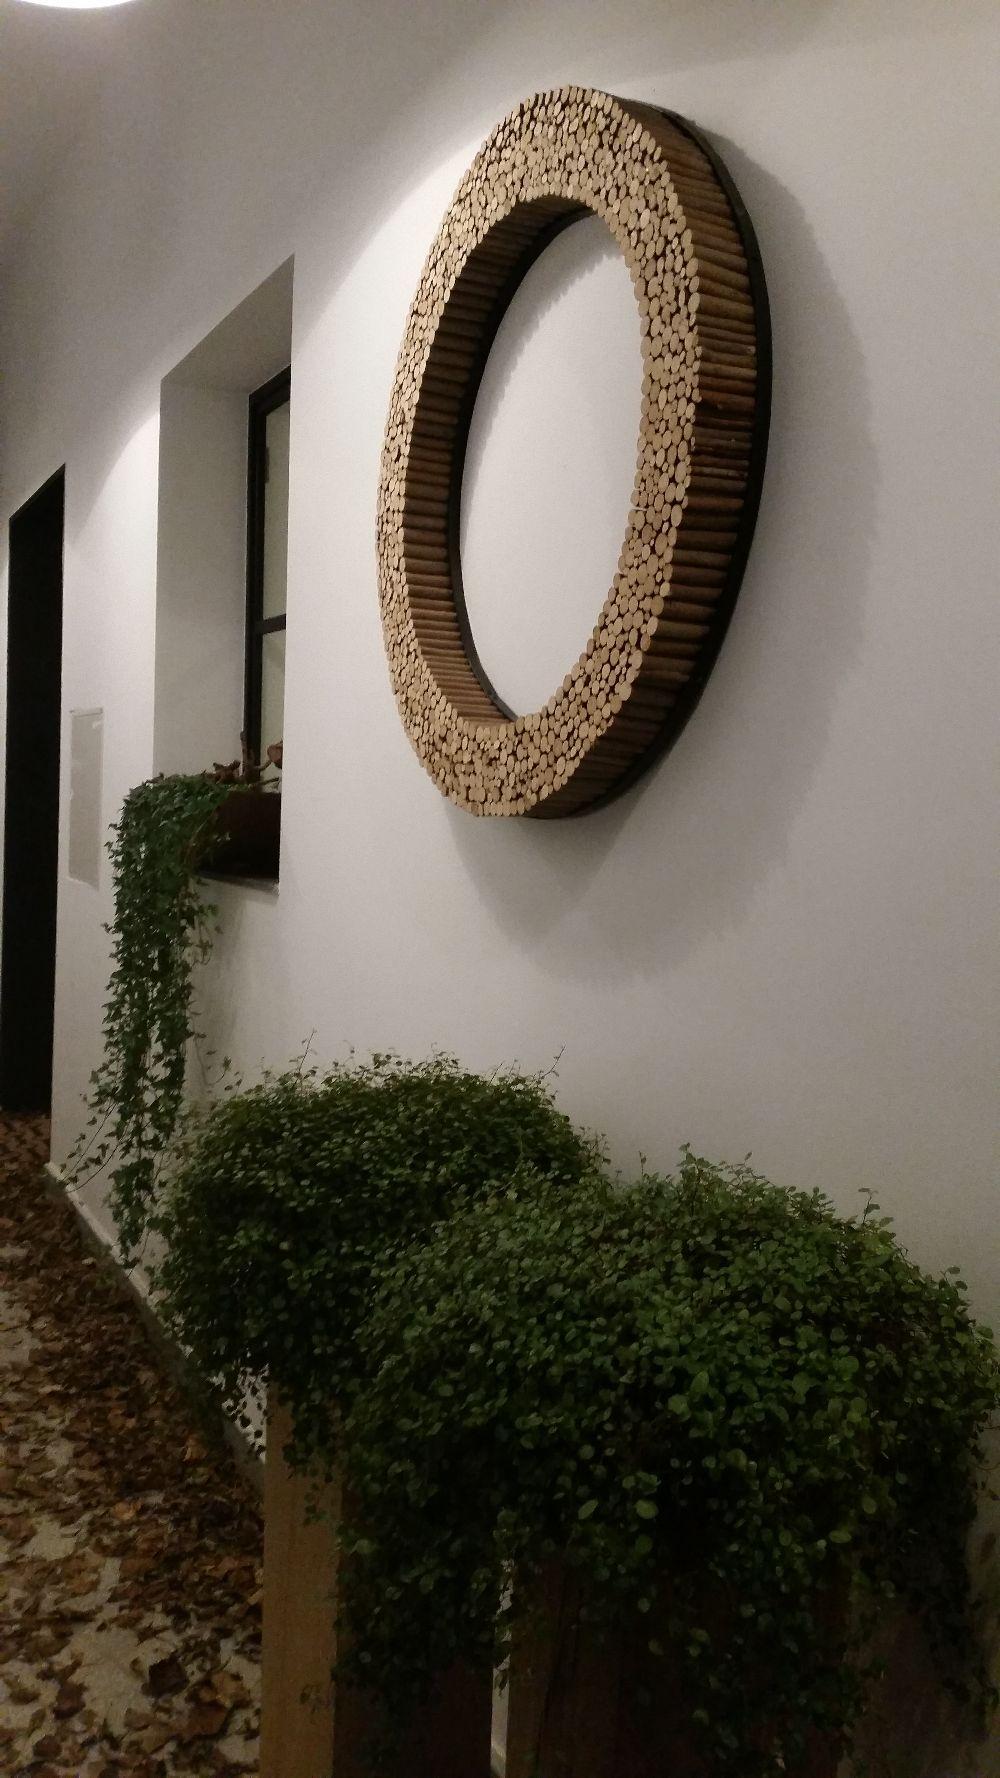 adelaparvu.com despre 45 de ani aniversare Floraria Iris, design floral Nicu Bocancea (34)